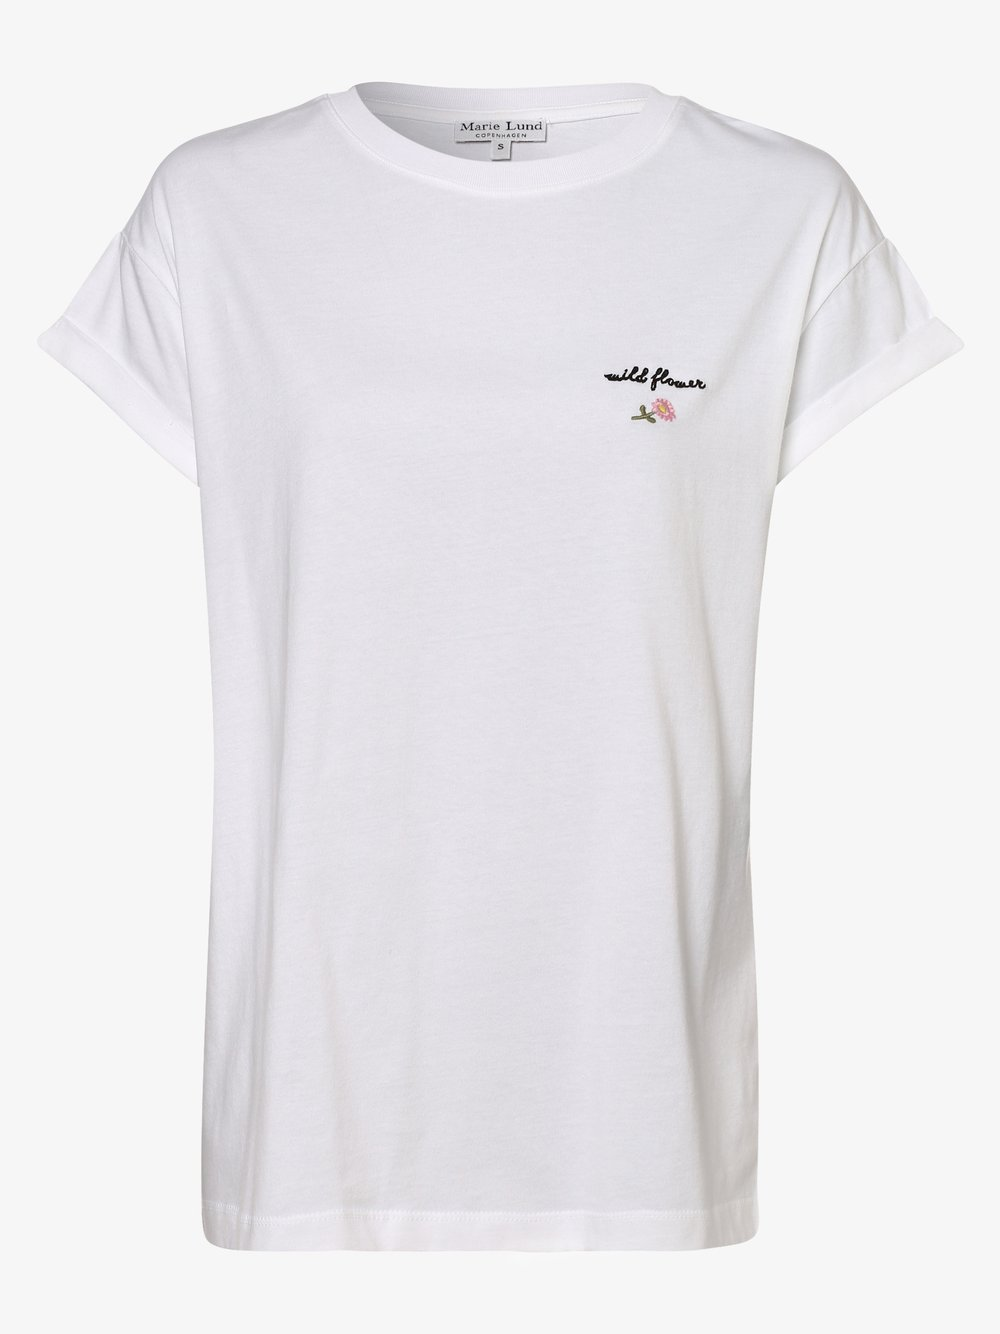 Marie Lund - T-shirt damski, biały